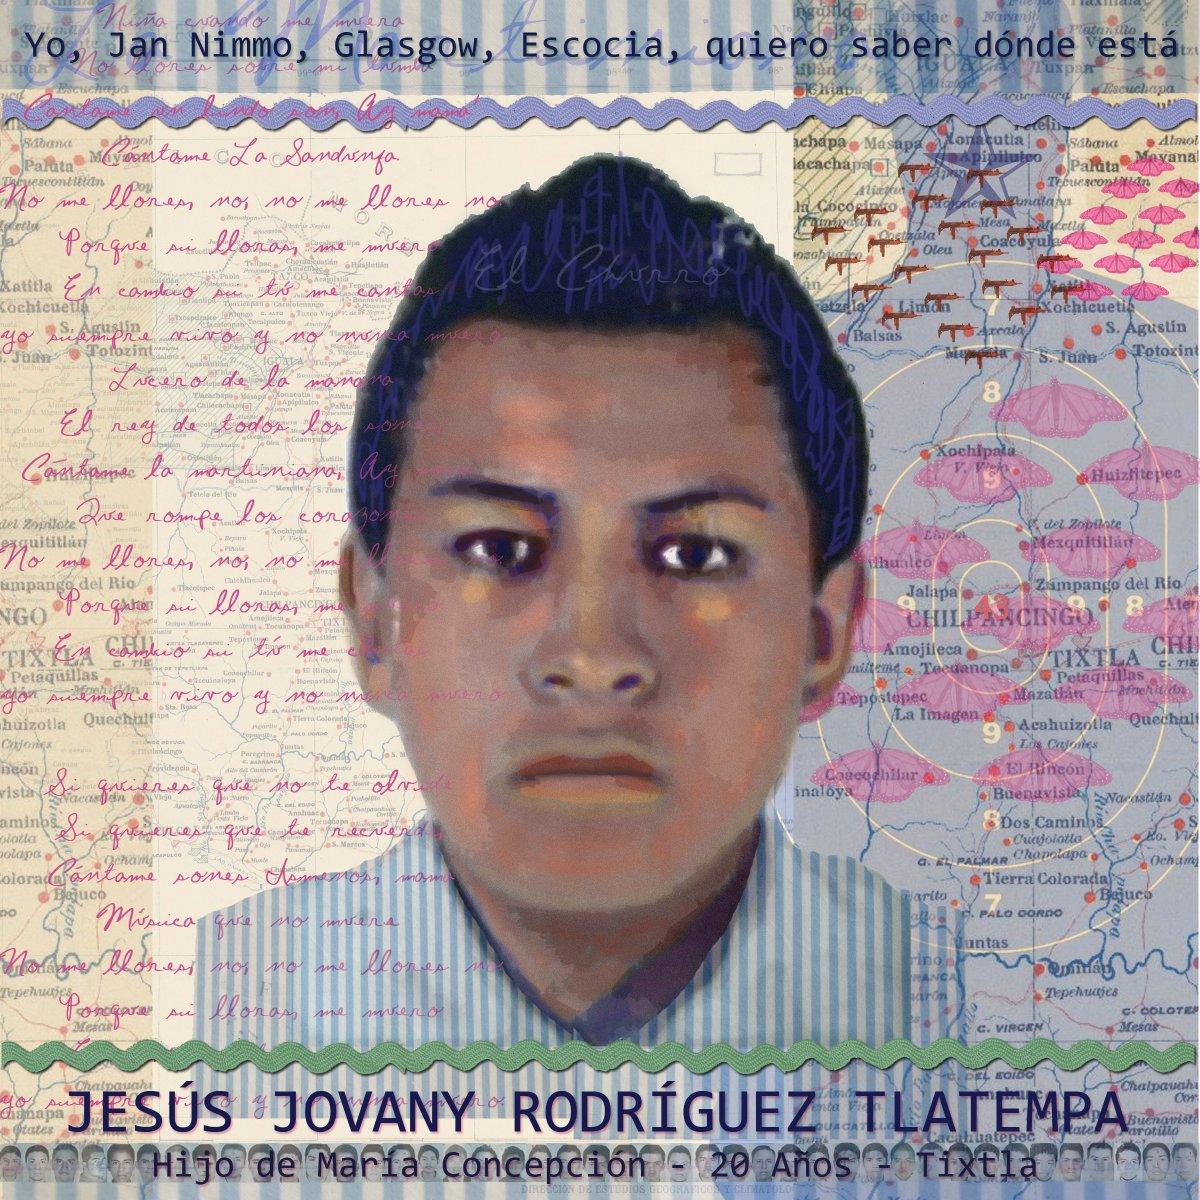 21 Jesús 22 Jonás 23 JorgeAlvarez 24 Jorge Anibal AyotzinapaVerdadyJusticia NoMasImpunidad ErradicaremosLaCorrupcion #TransformaremosMexico @cosio_joaquin @gimenezcachopic.twitter.com/GPZBEM1RLb